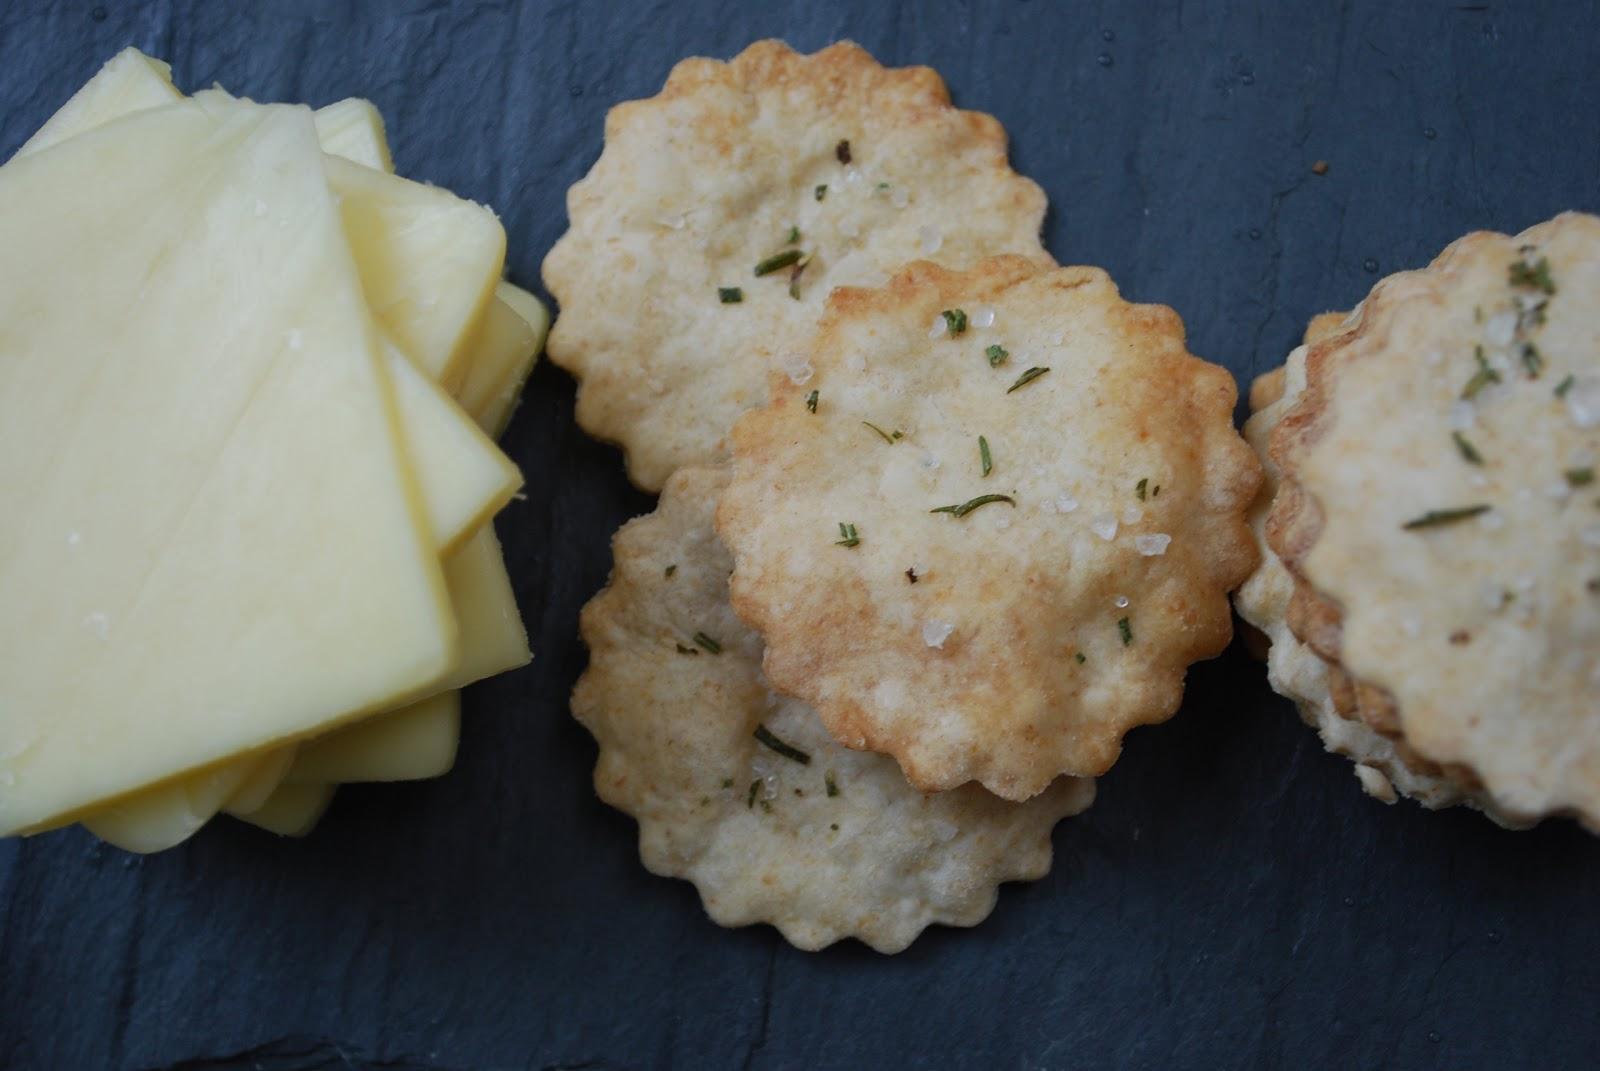 Cheese Please: Rosemary Sea Salt Crackers1600 x 1071 jpeg 137kB